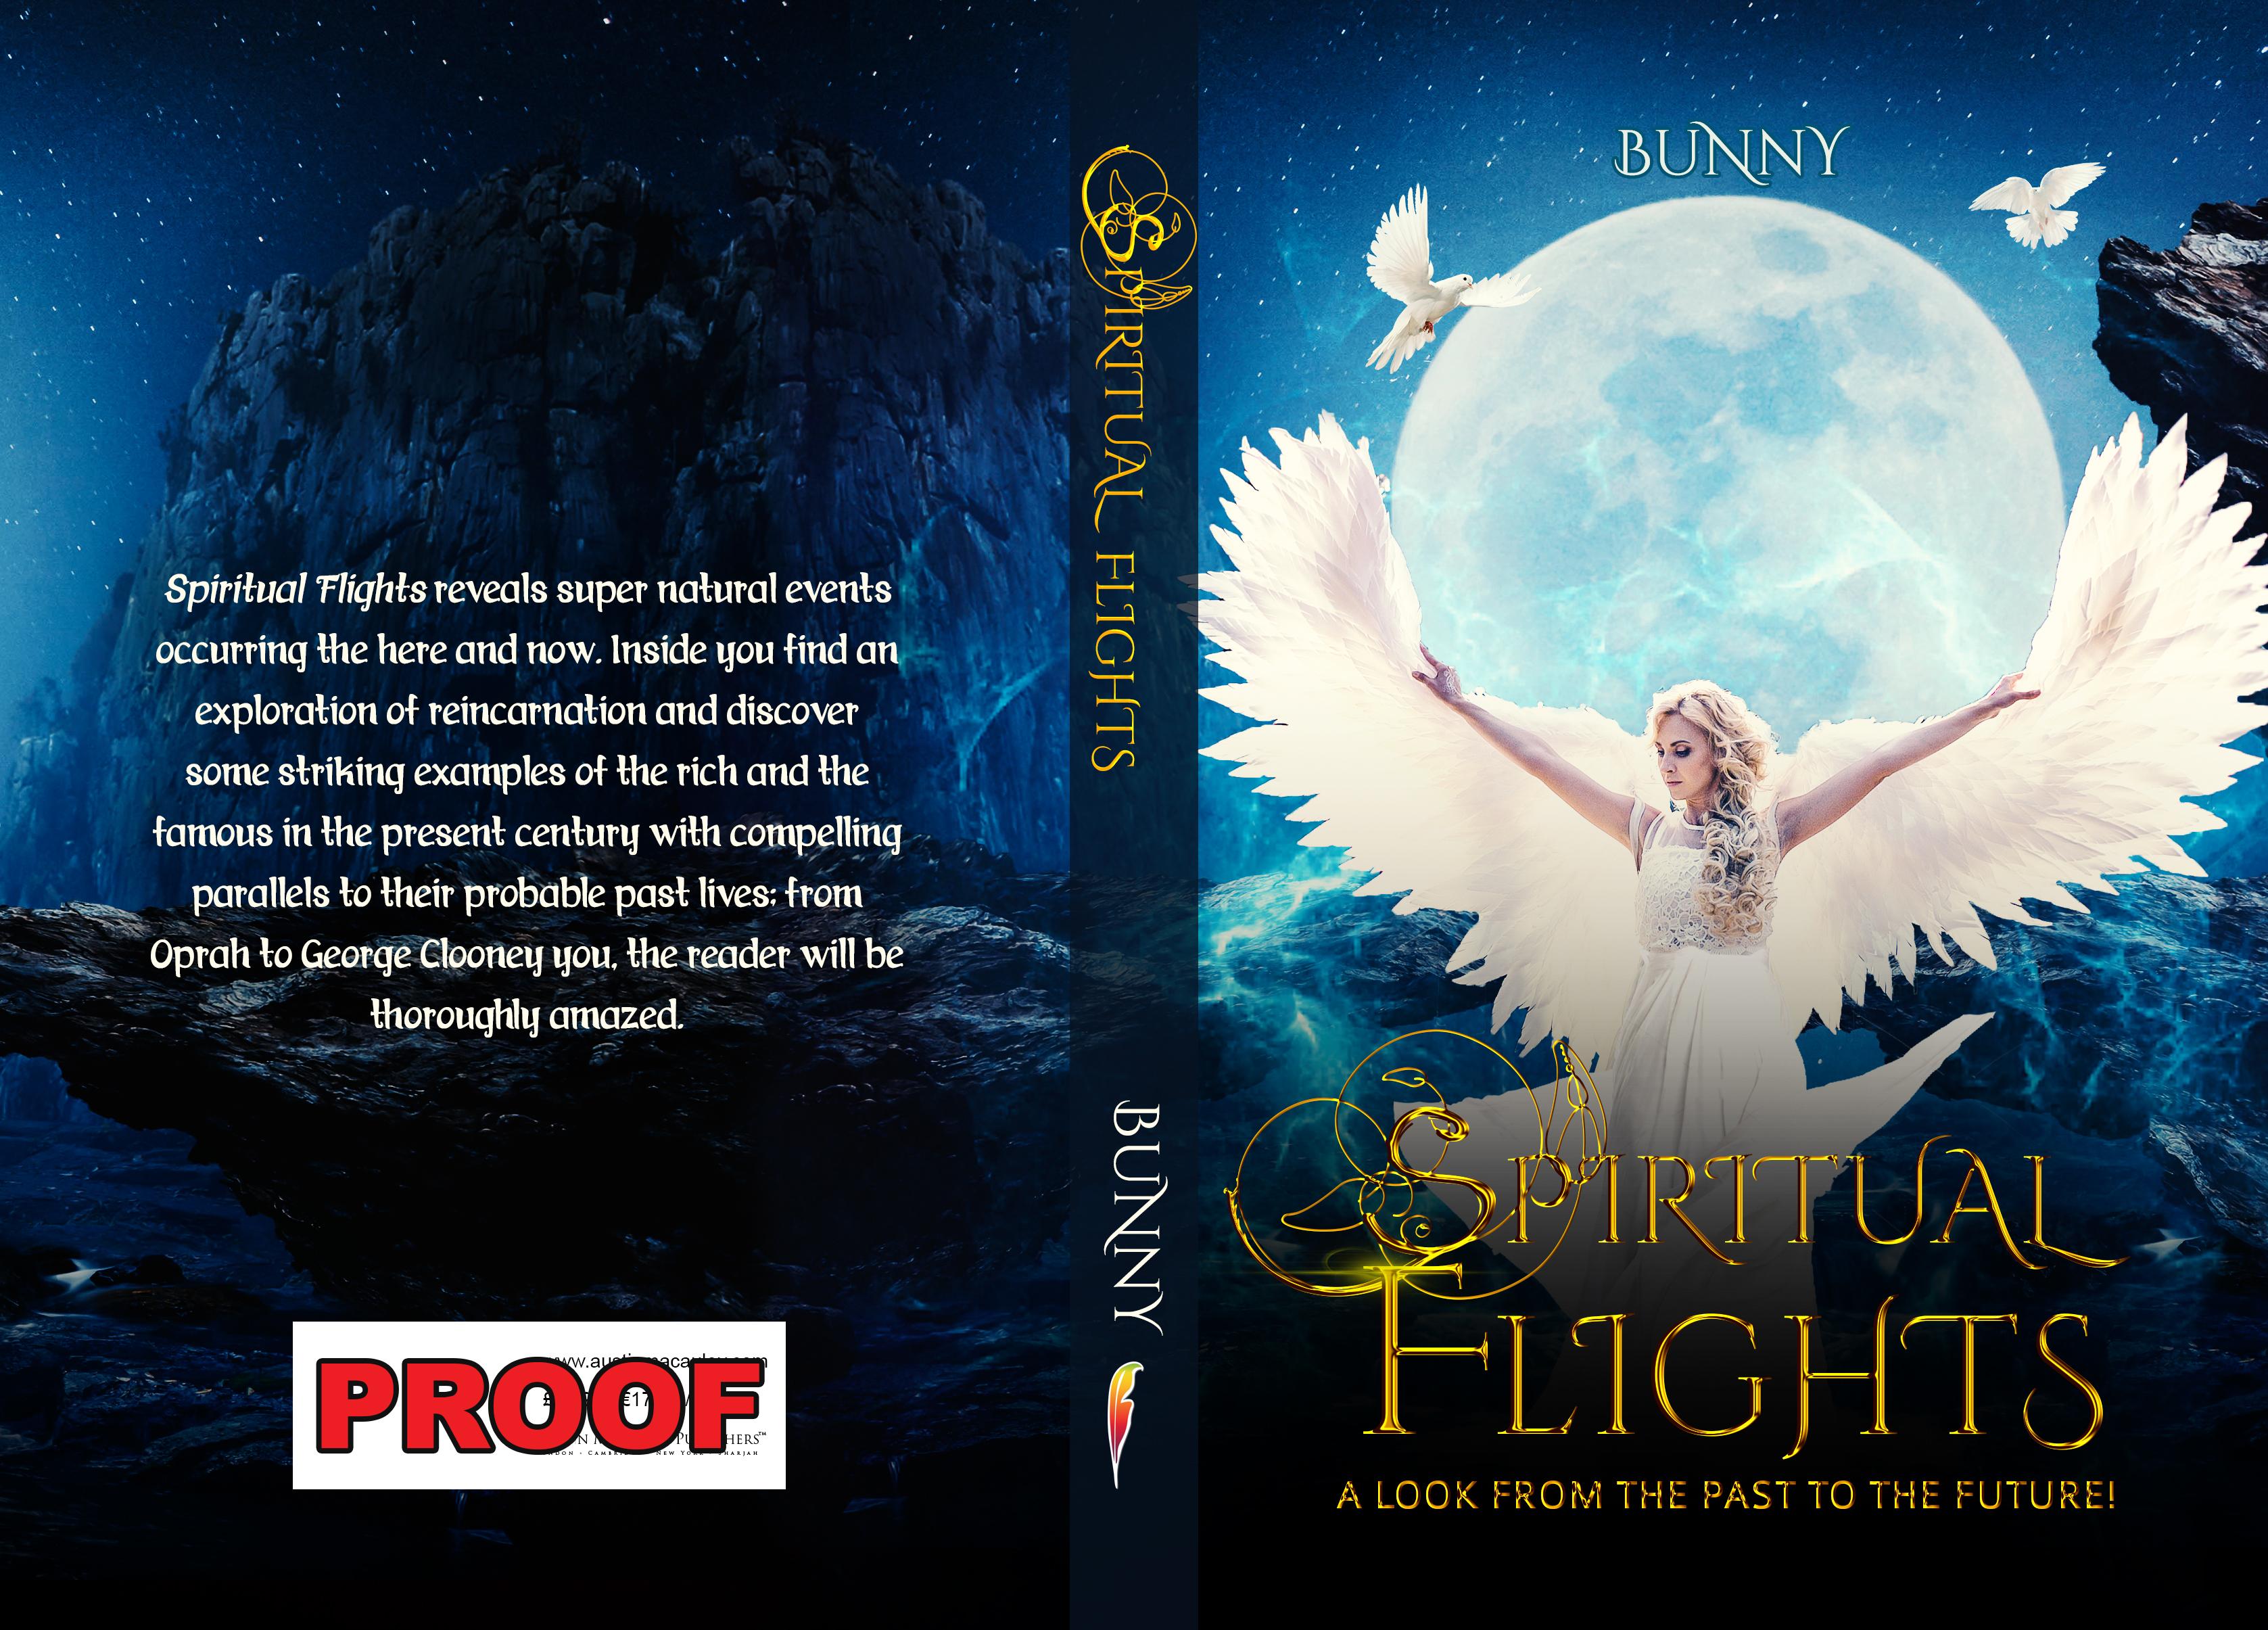 Spiritual Flights by Bunny